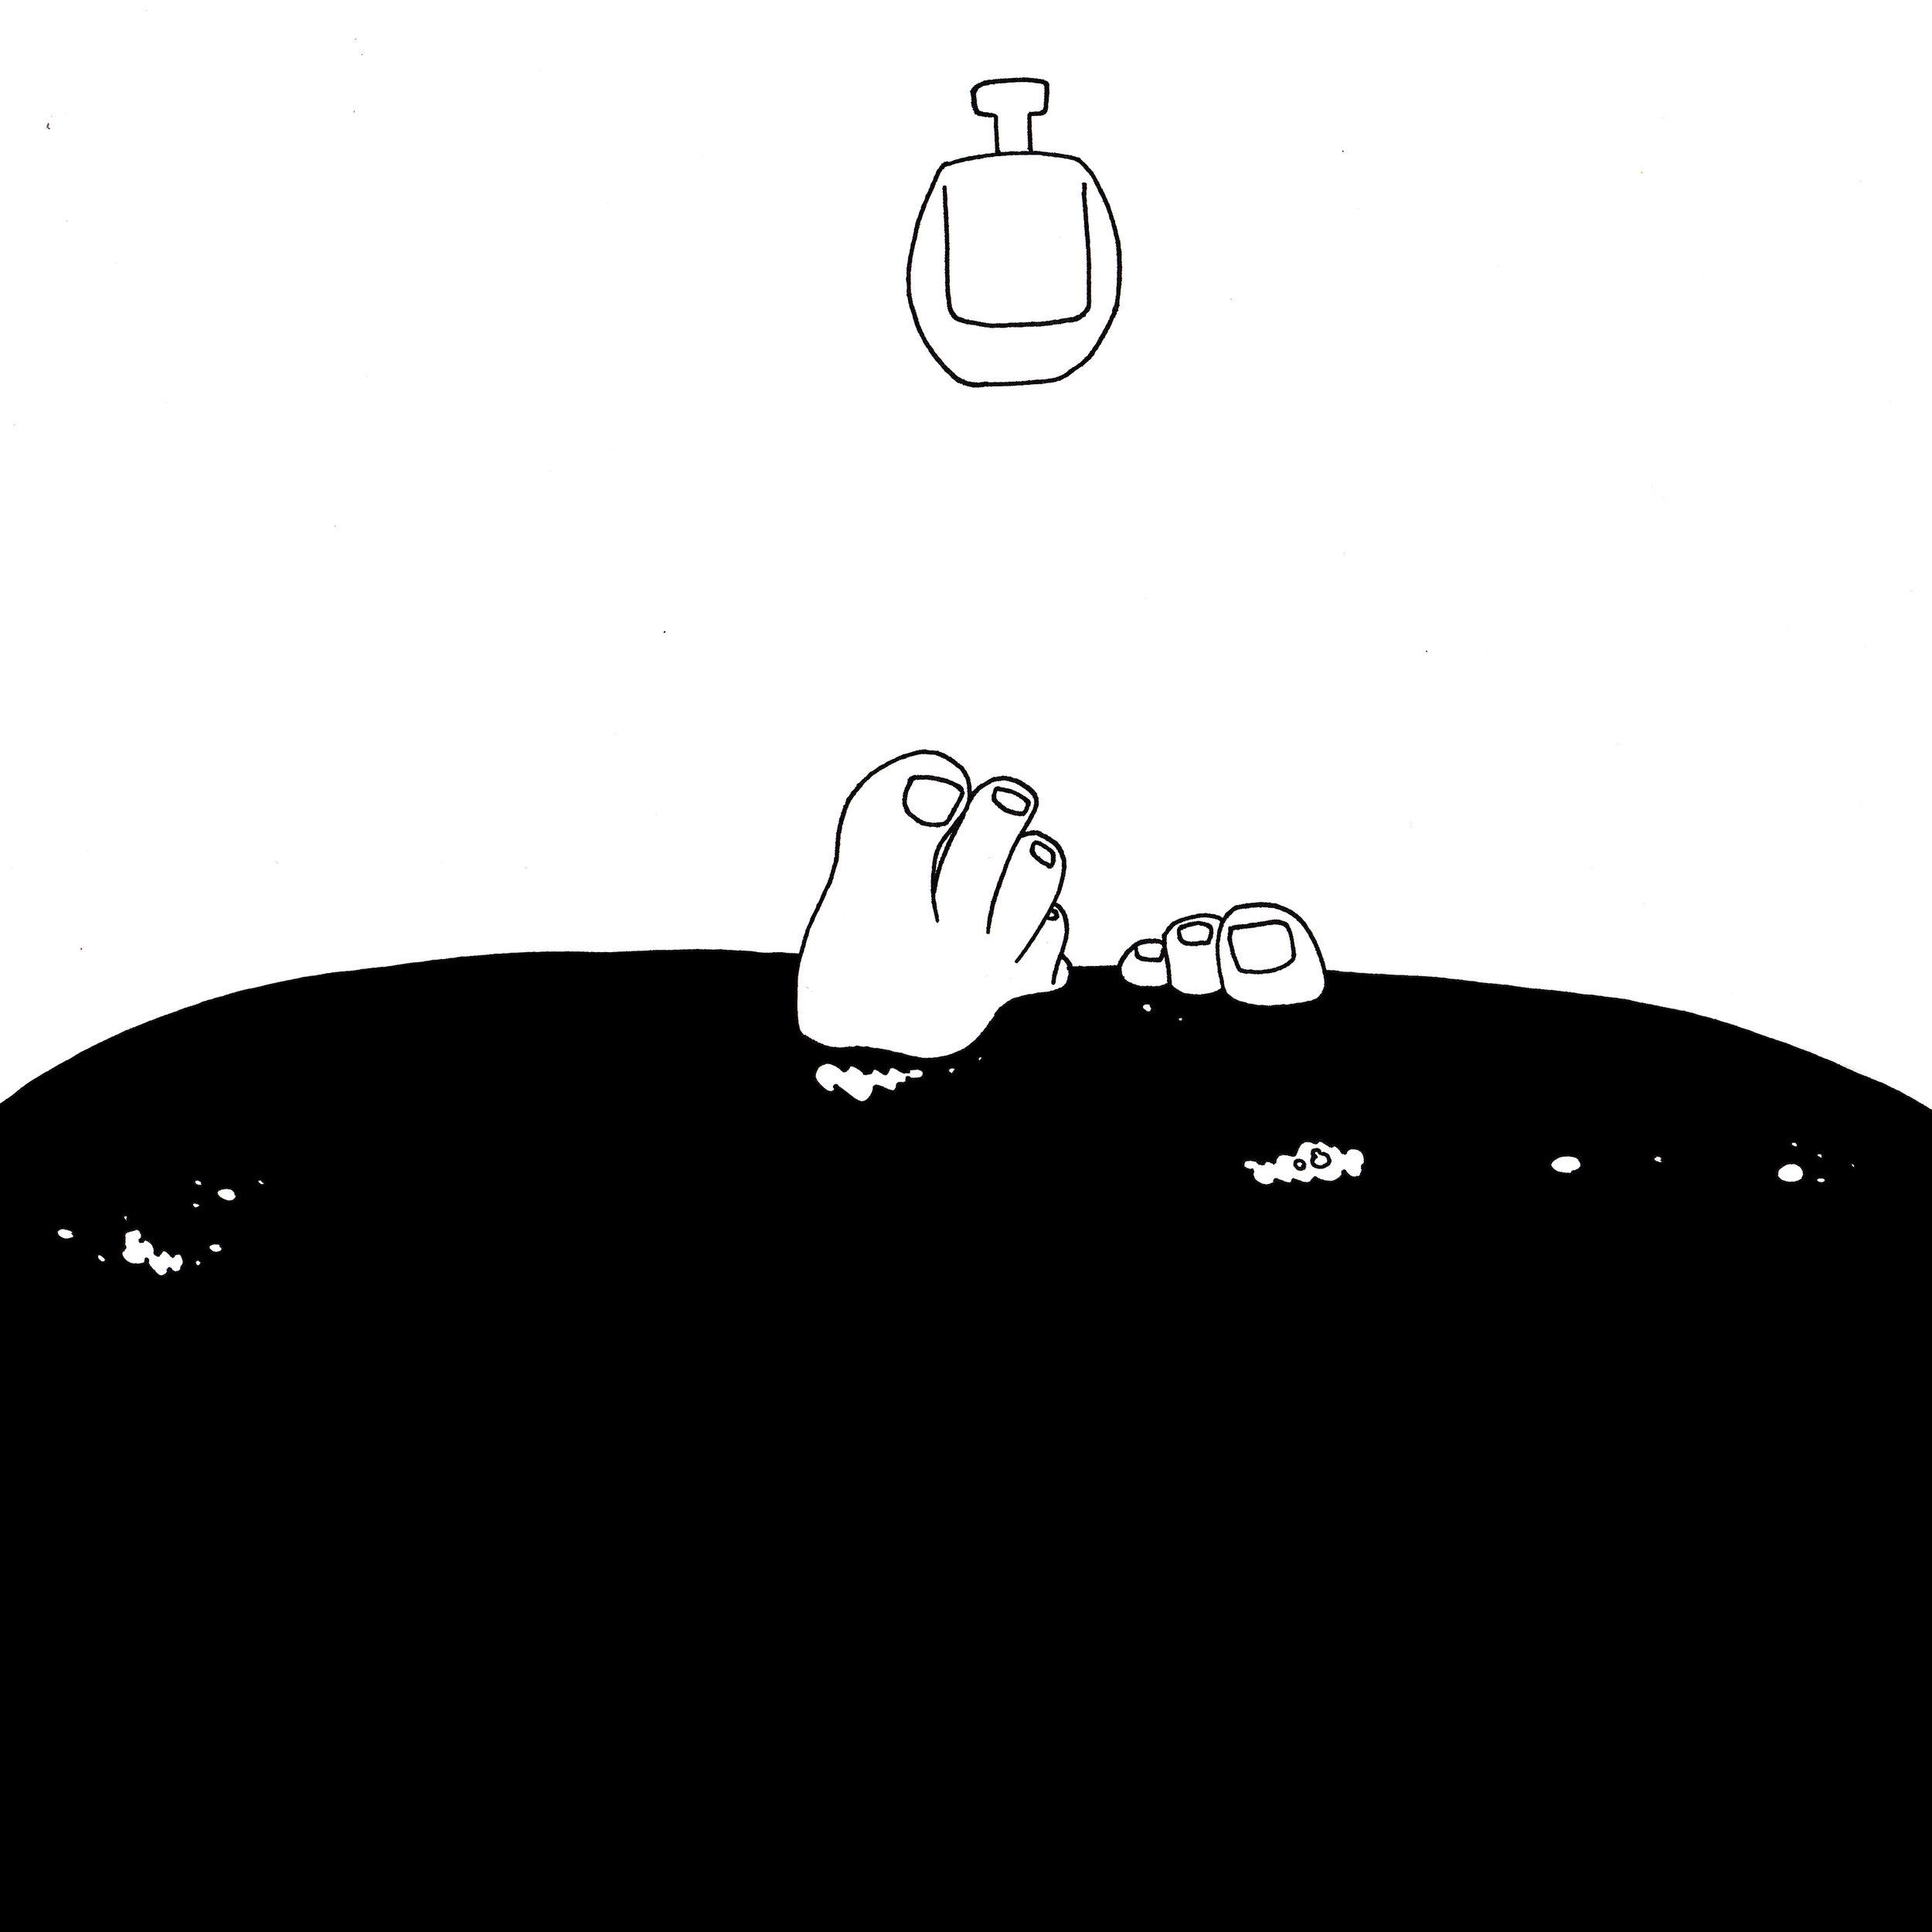 bathtub_01.jpg